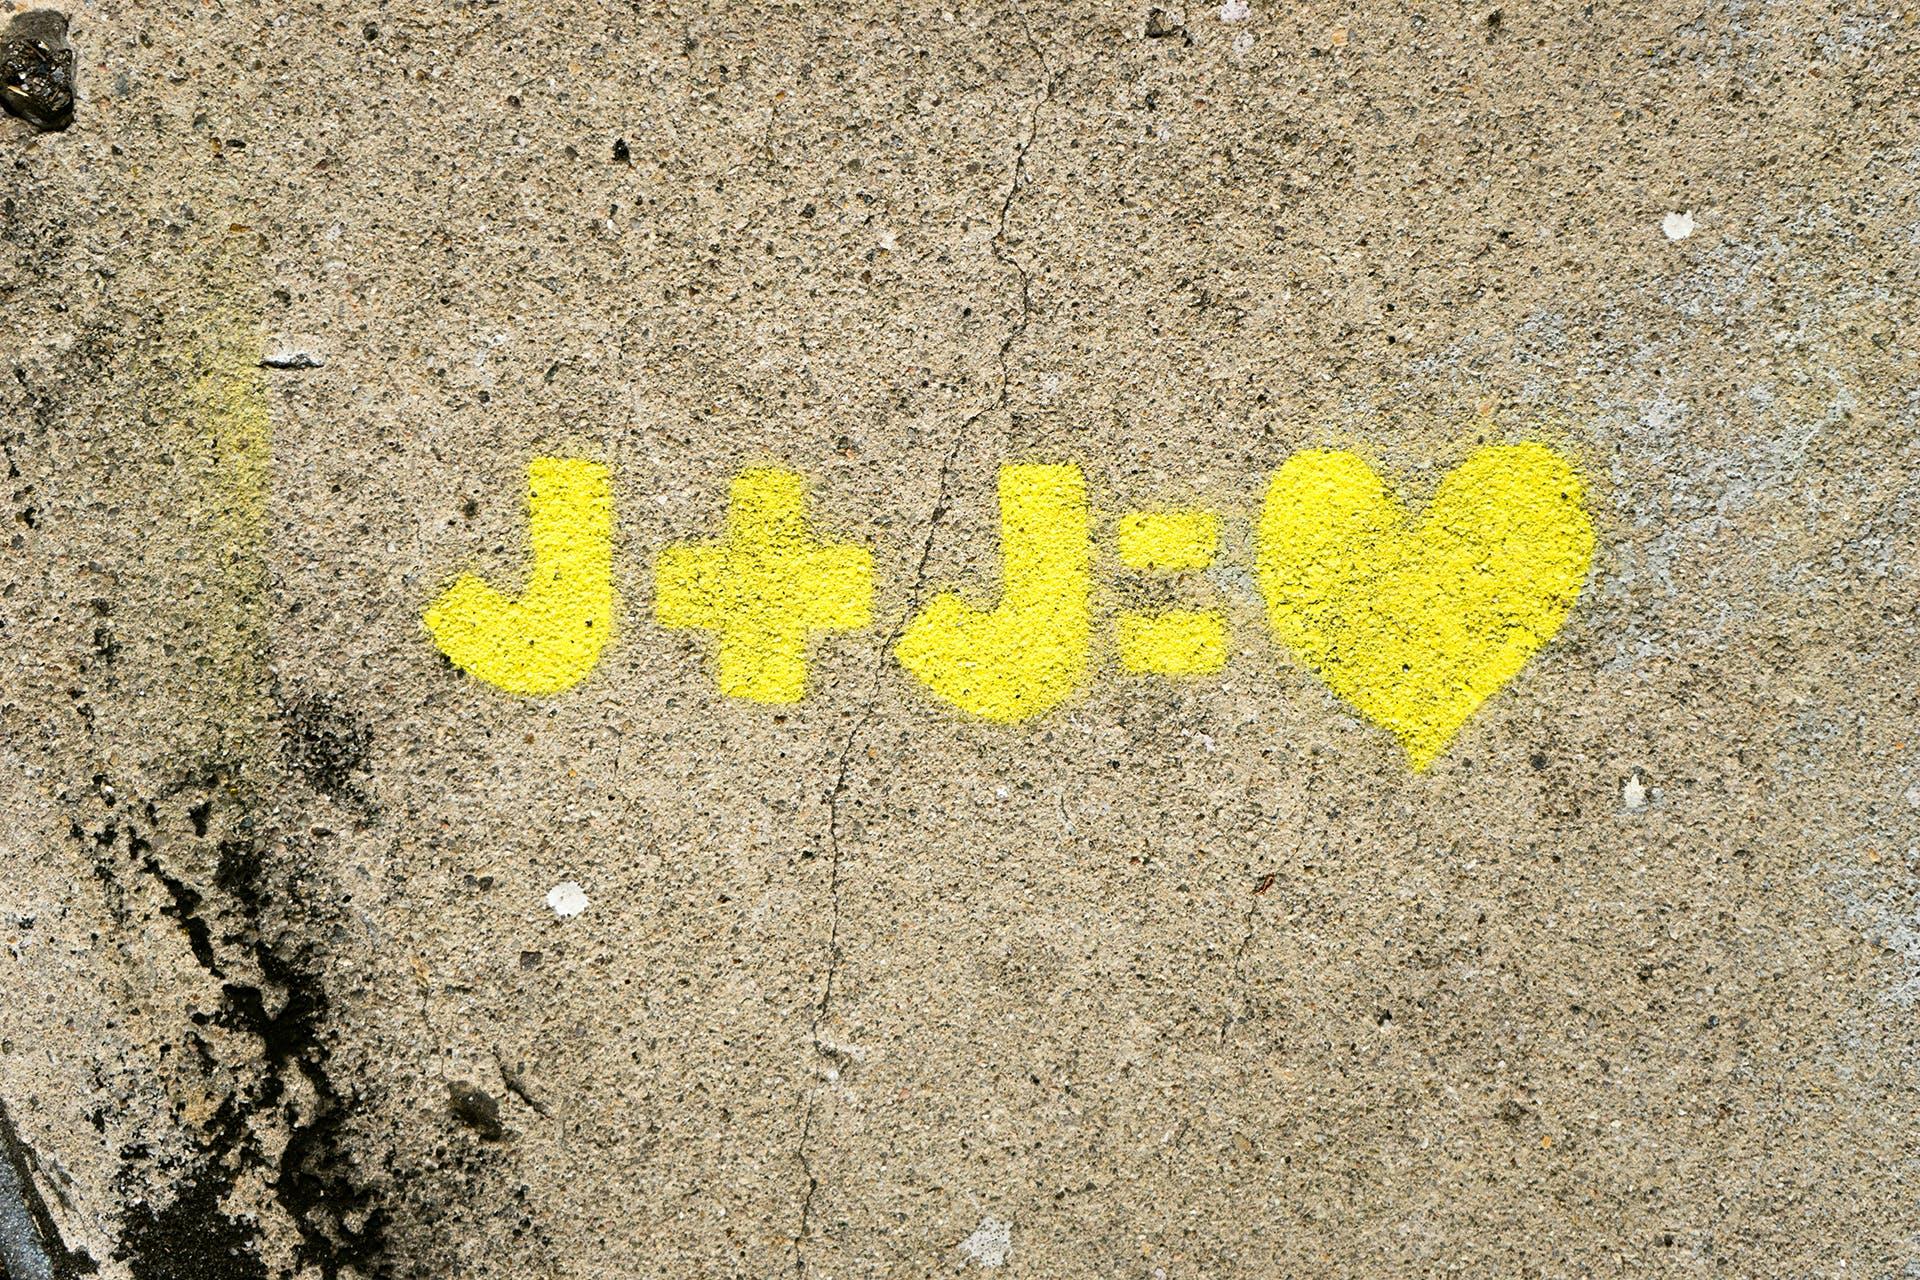 j + j, 心臓, 愛